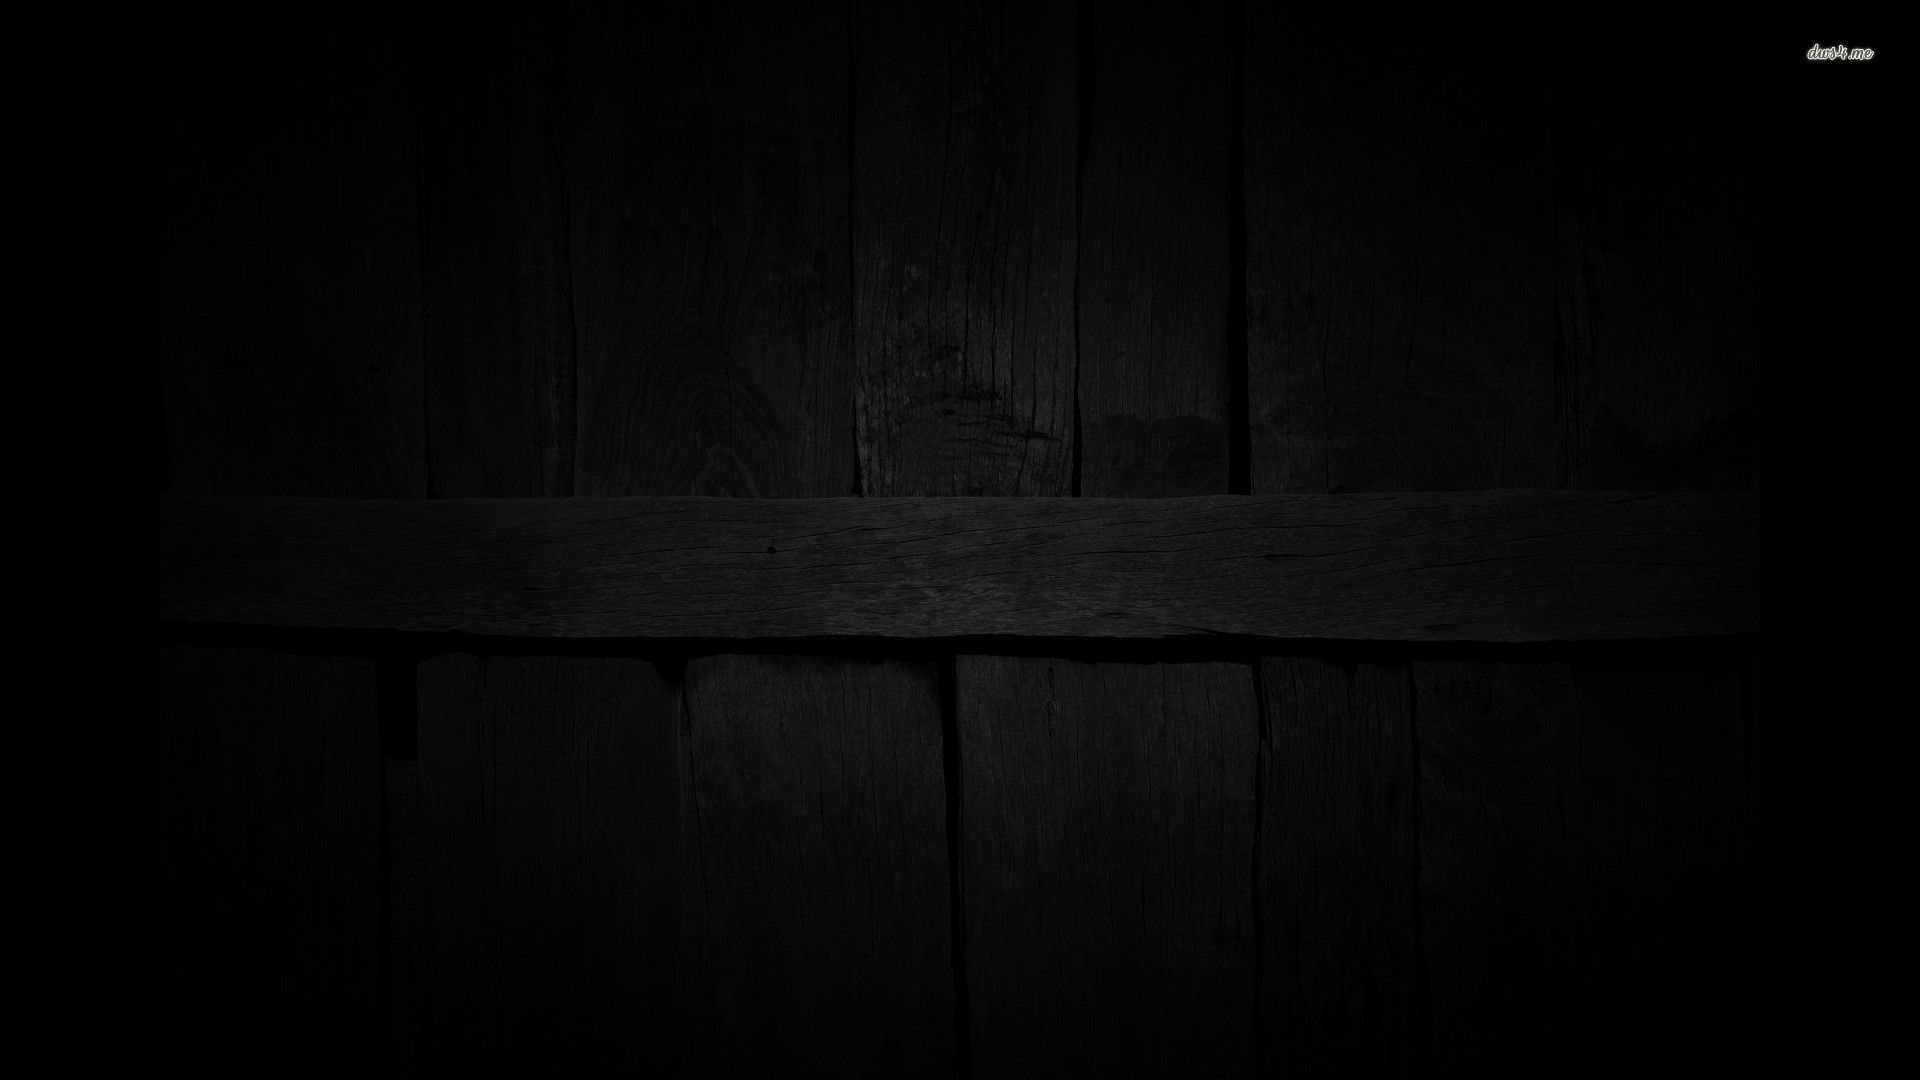 Dark Abstract Wallpapers On Wallpaperdog